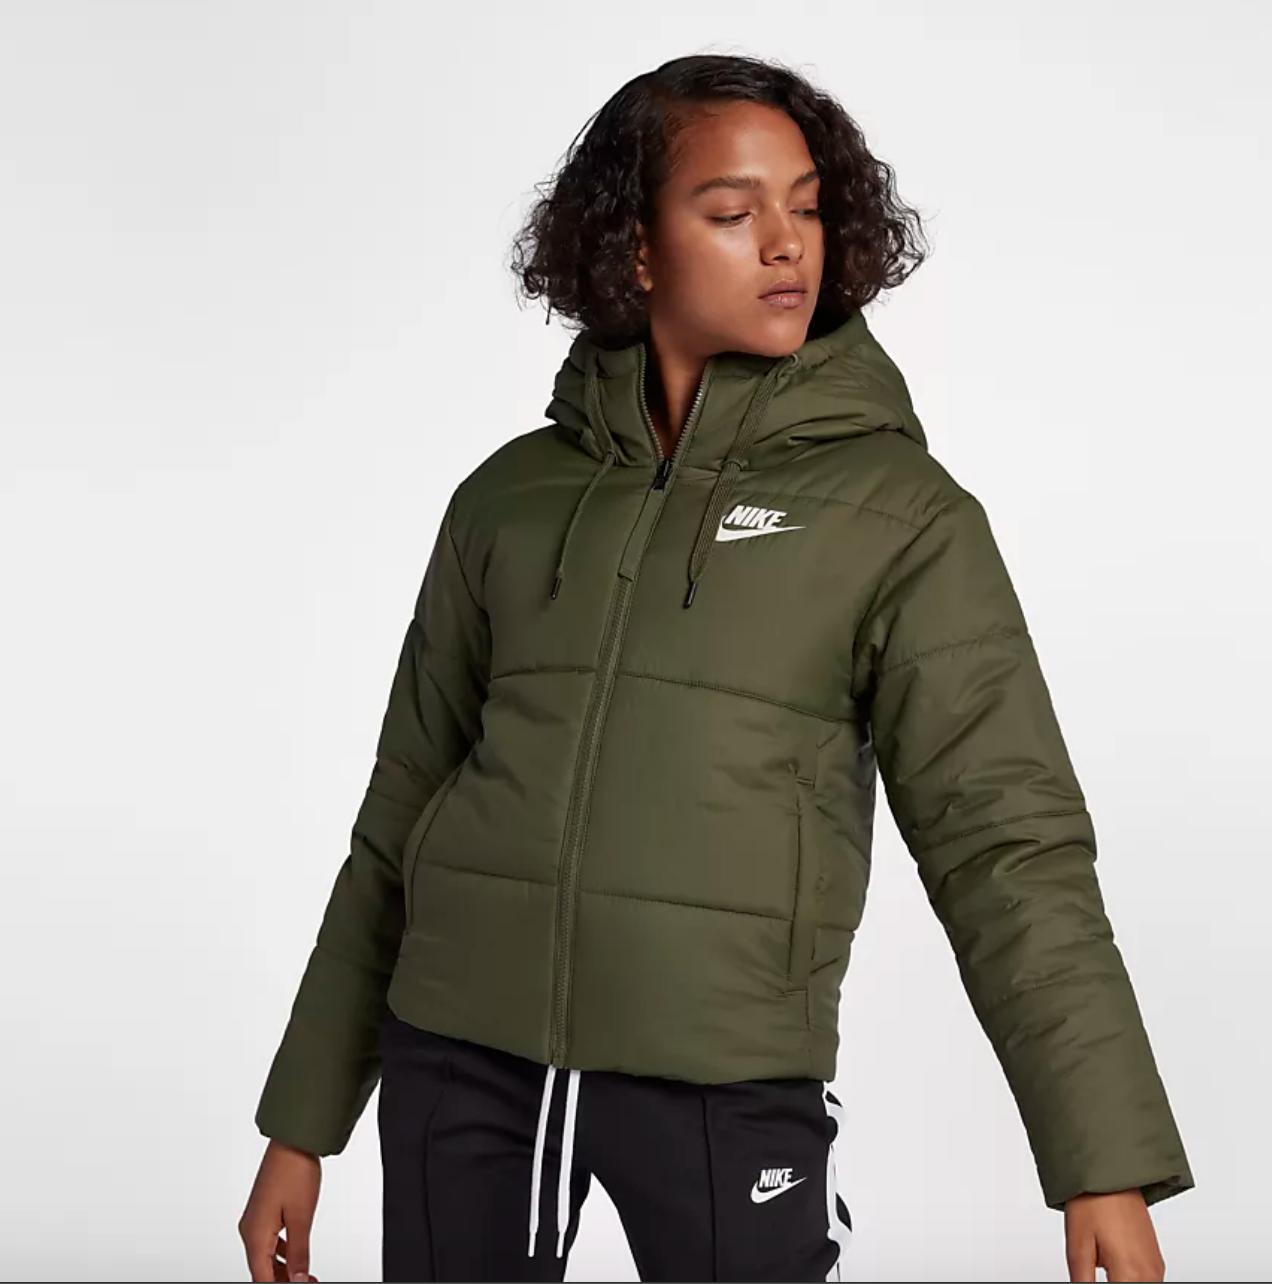 Reversible Jacket Synthetic 450₪ לפני הנחה